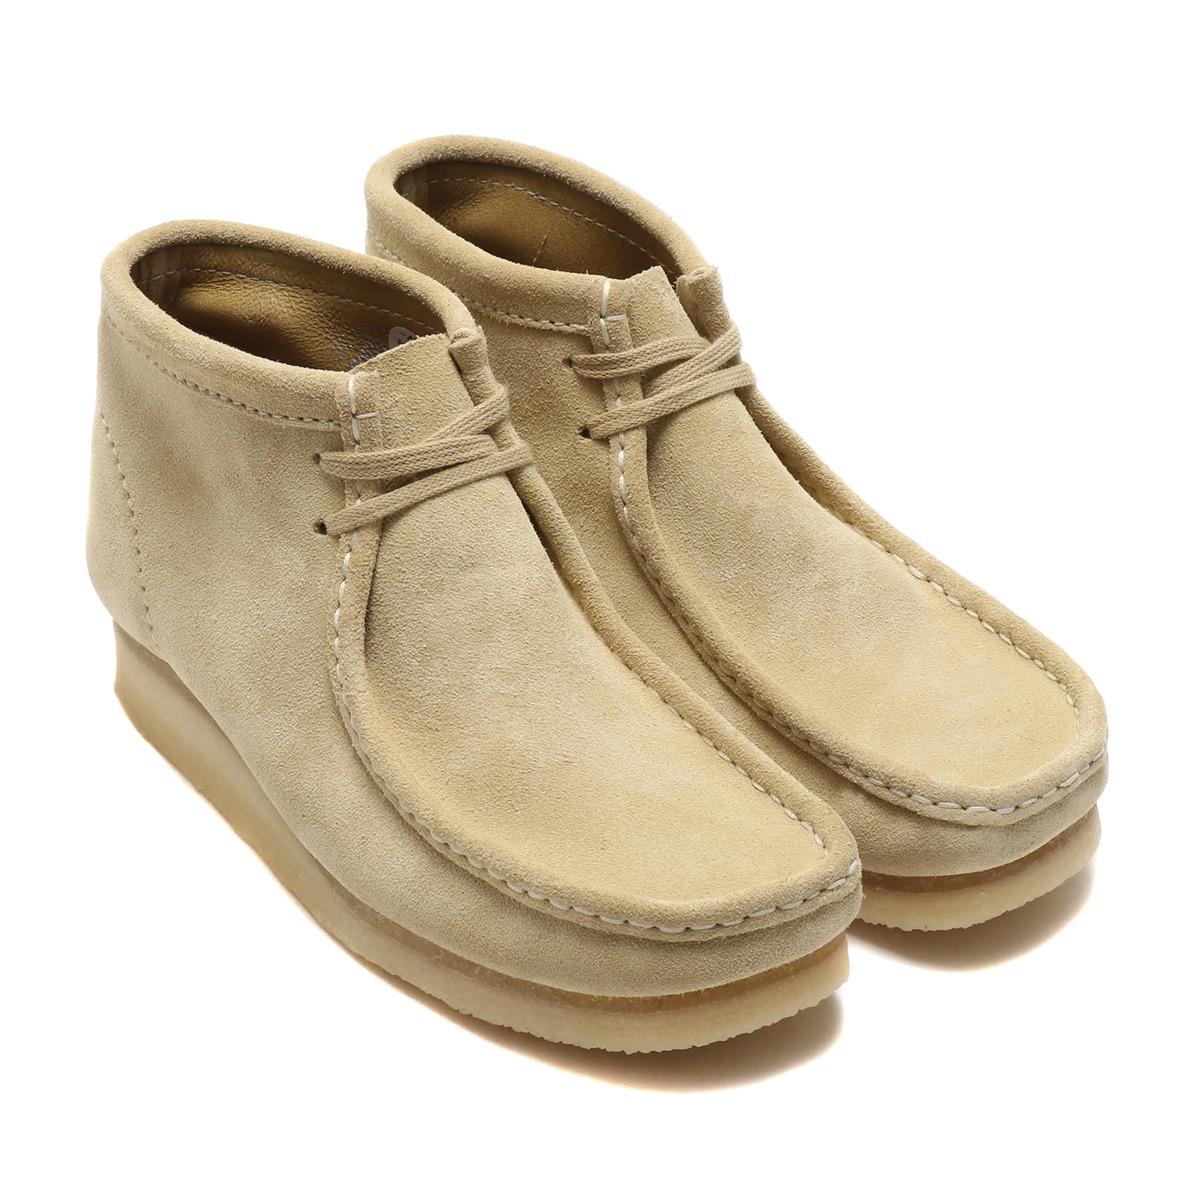 Clarks WALLABEE BOOT(クラークス ワラビーブーツ)MAPLE SUEDE【レディース ブーツ】19FA-I